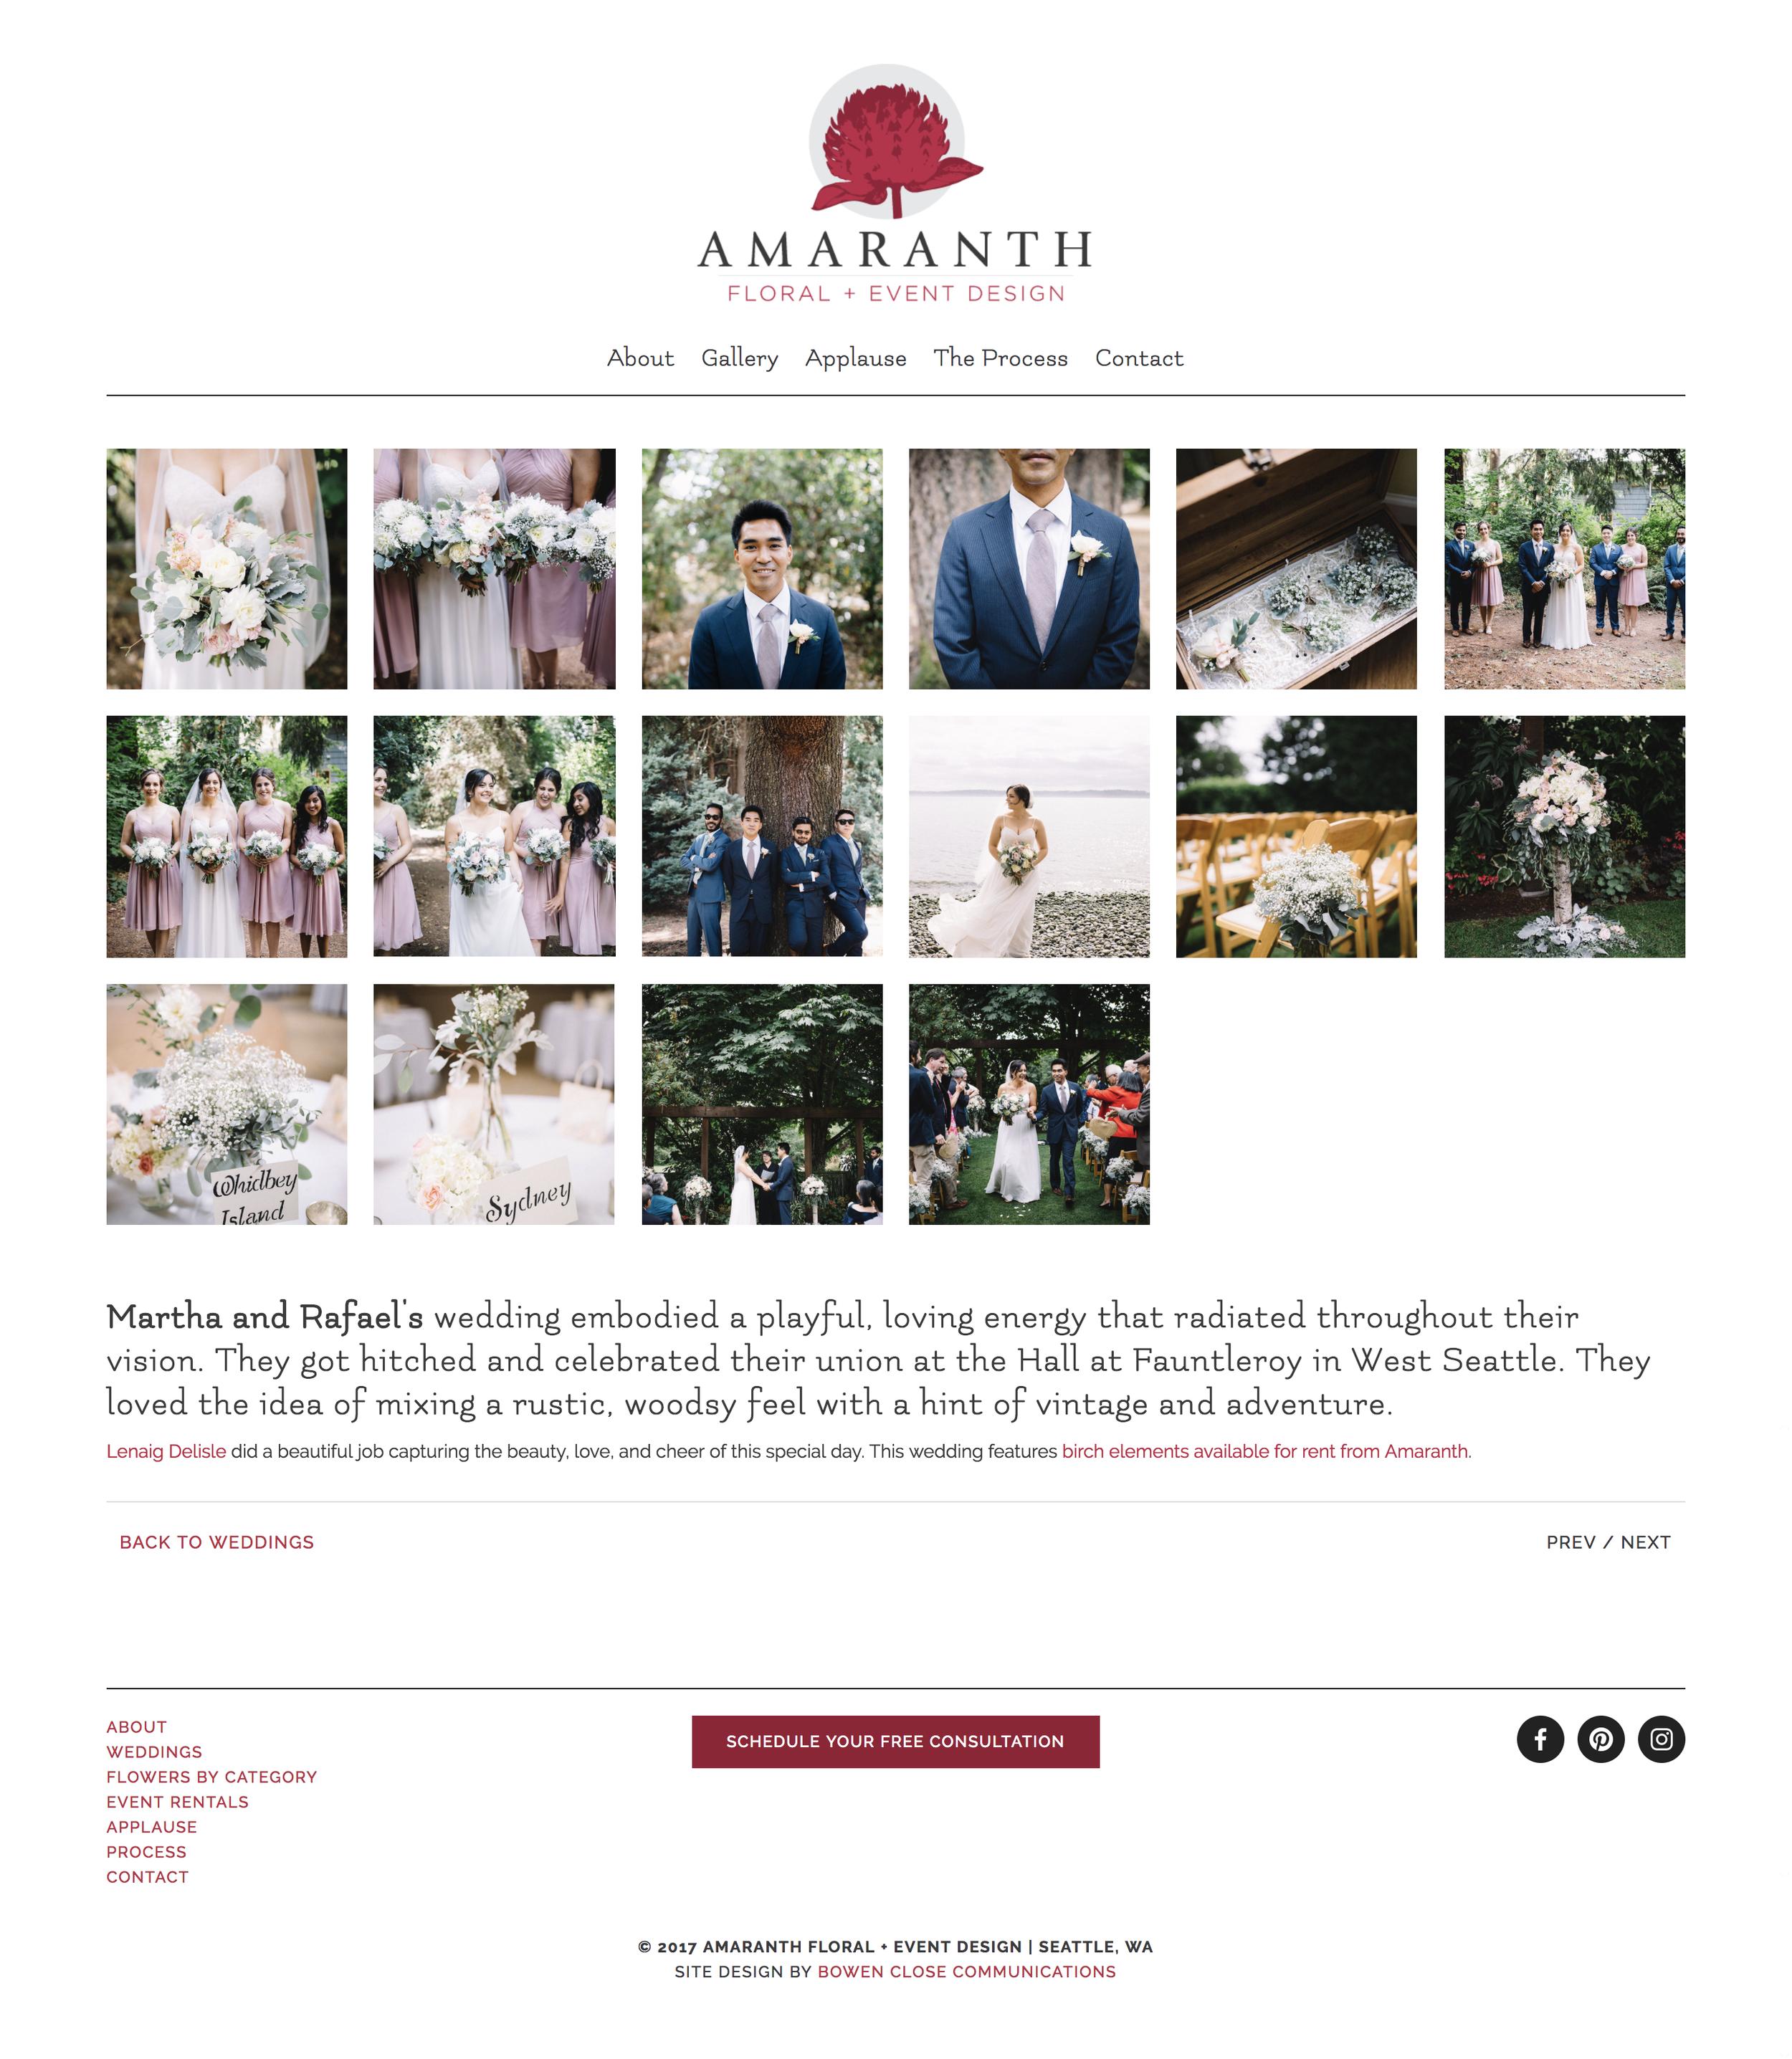 Amaranth - Wedding example.png